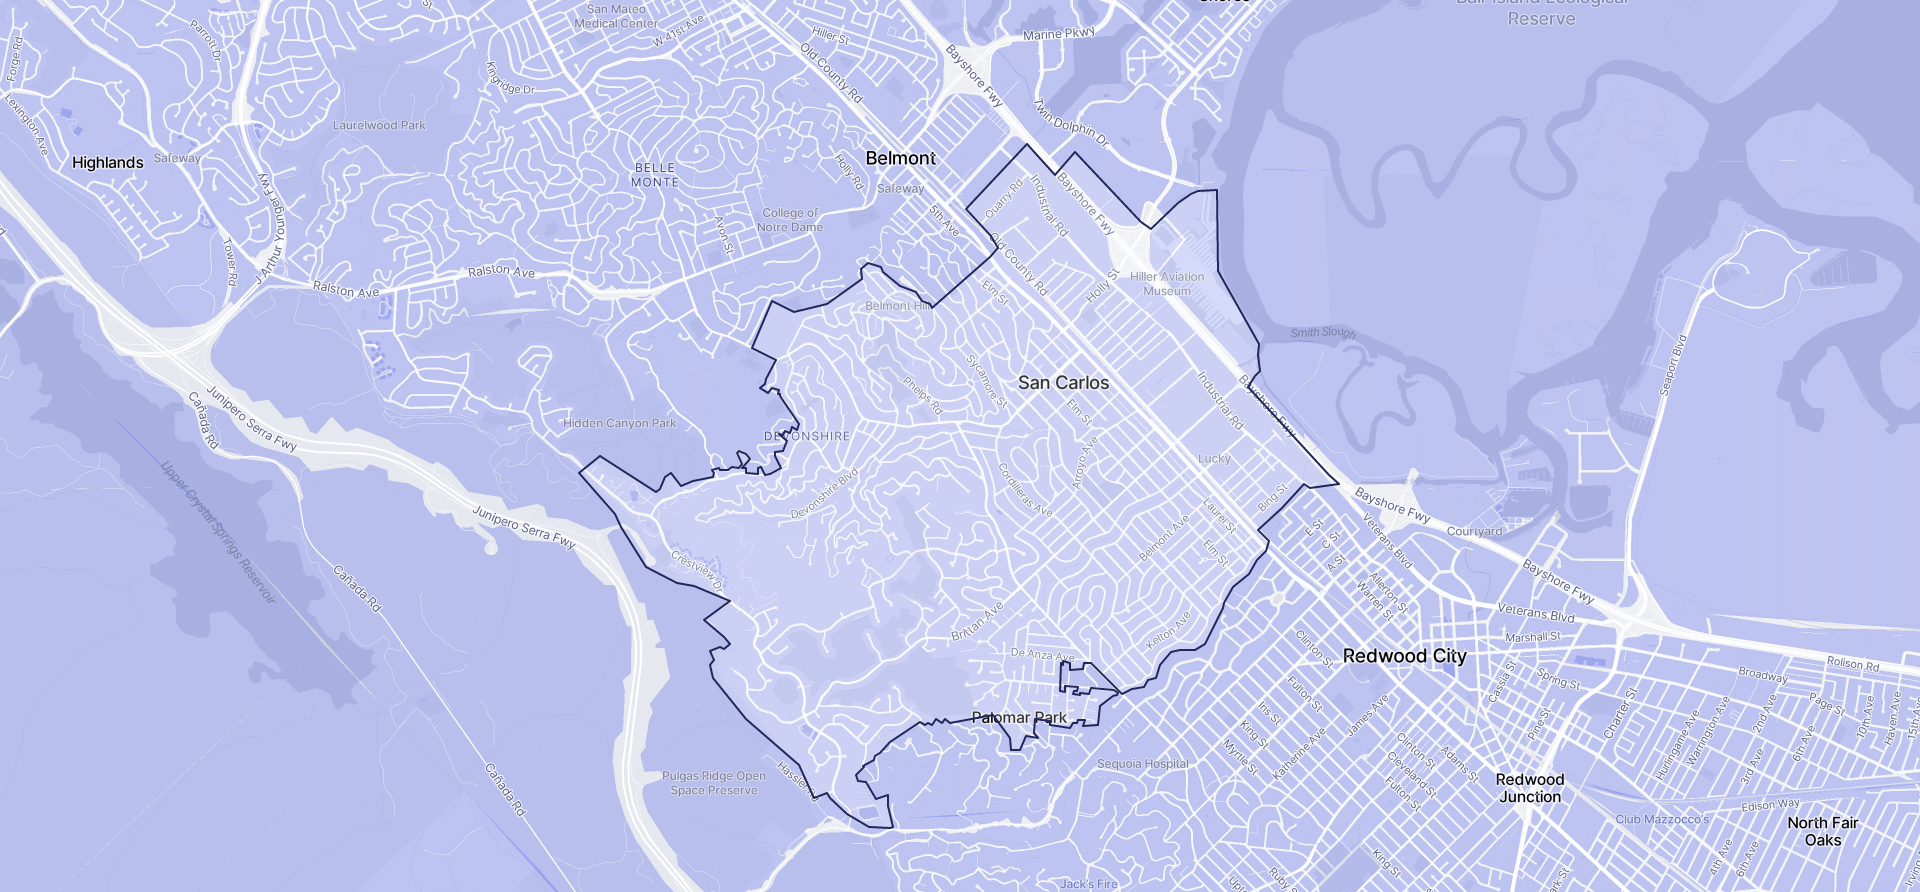 Image of San Carlos boundaries on a map.